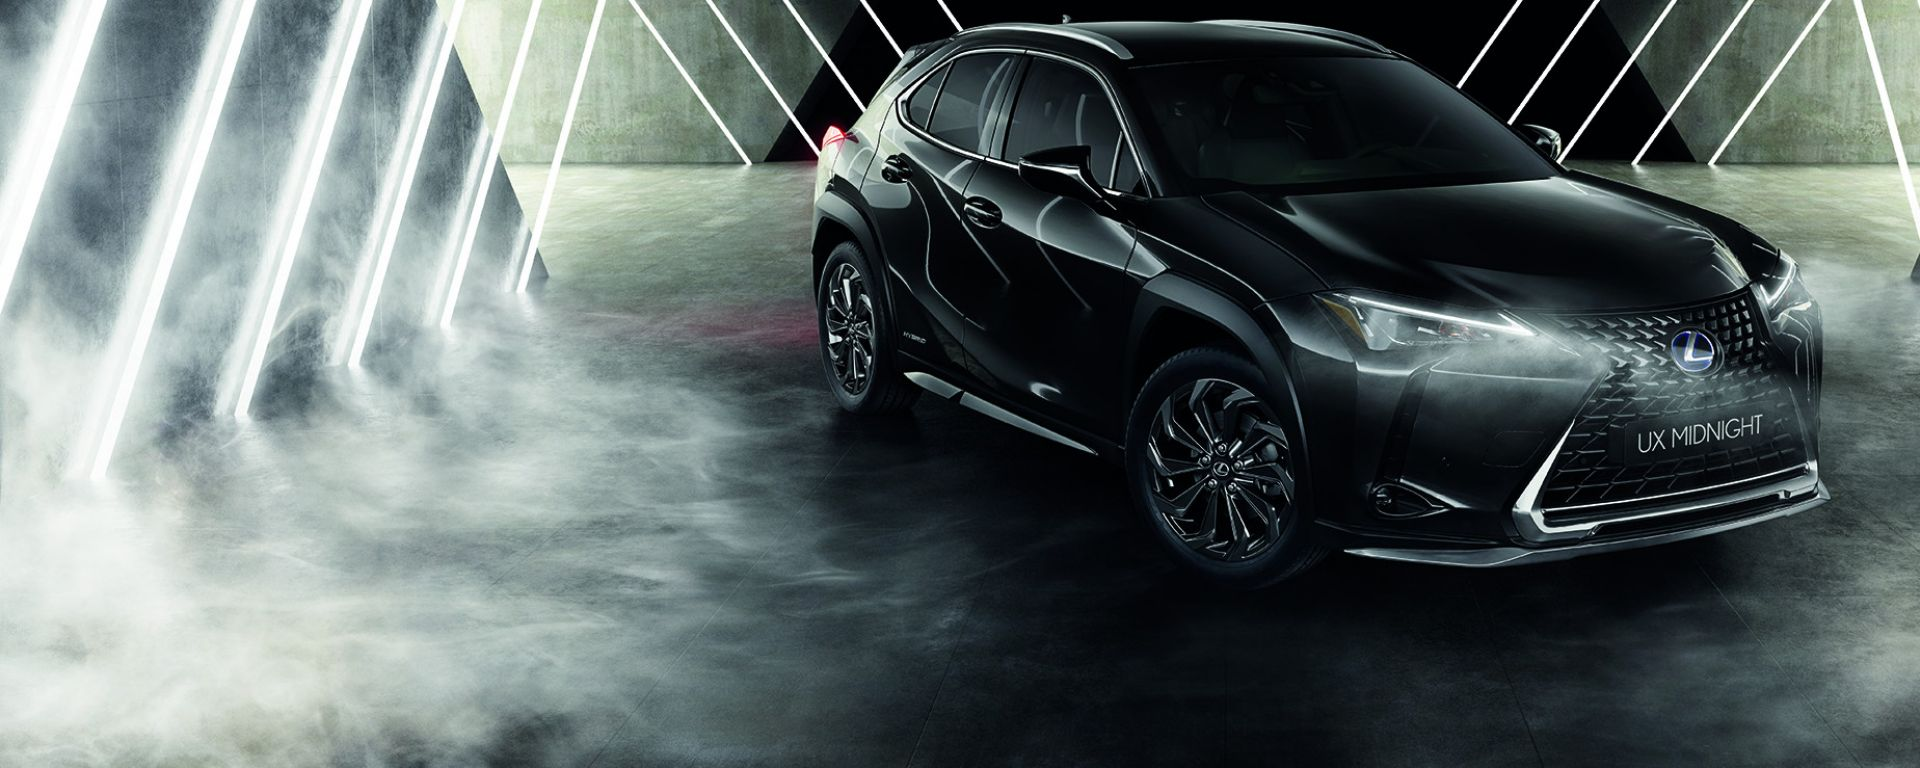 Lexus UX Hybrid Midnight Edition